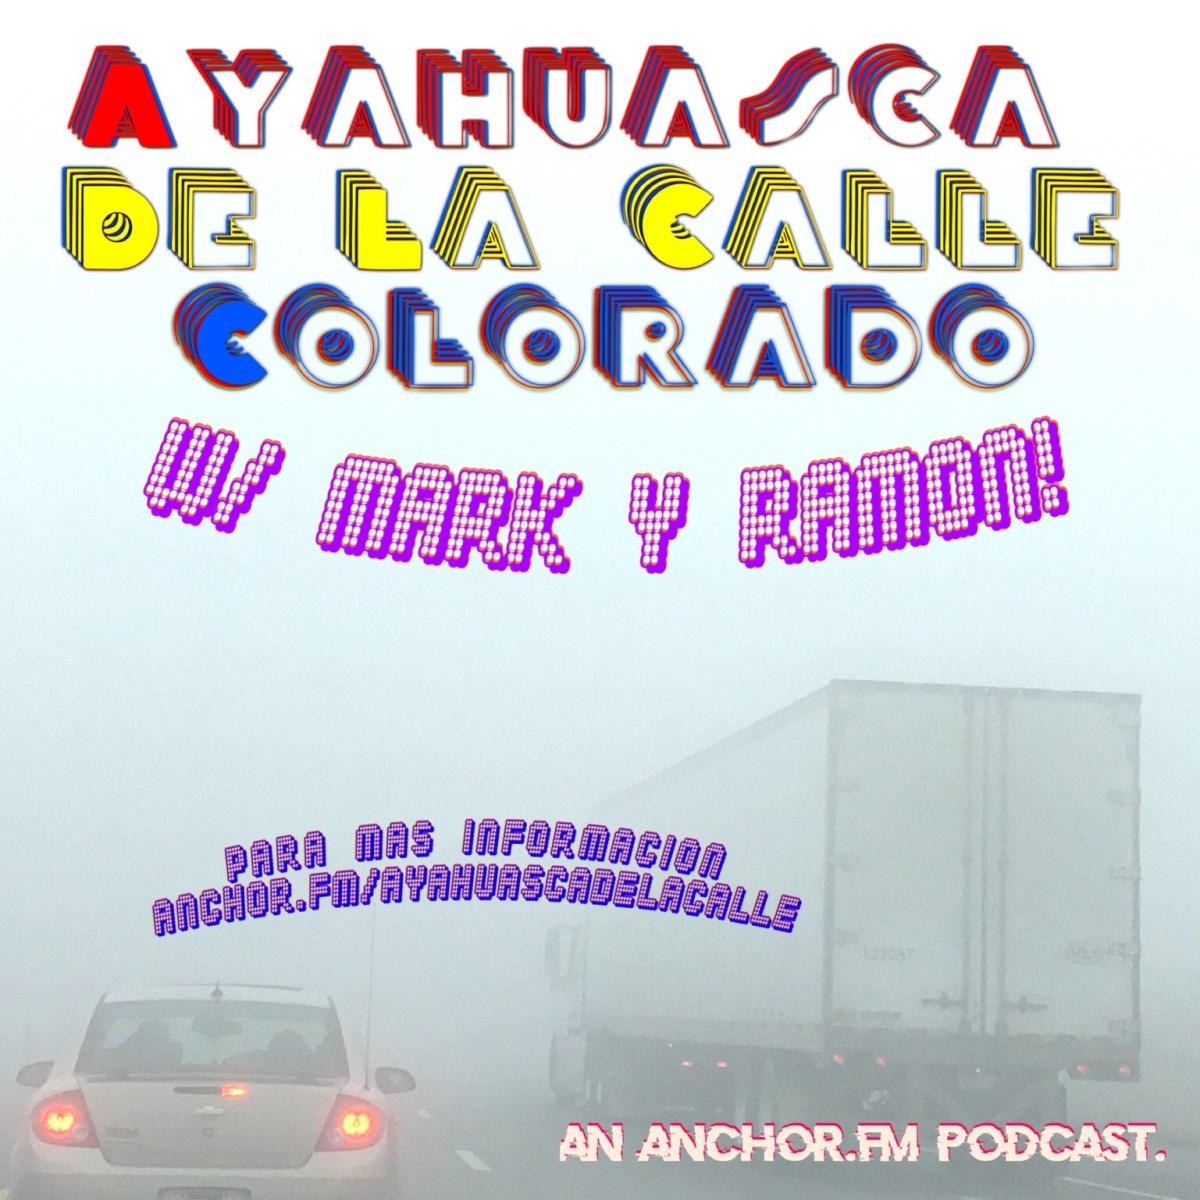 Esperanza Para 2019 - ¡Ayahuasca De La Calle Colorado! Episode 4